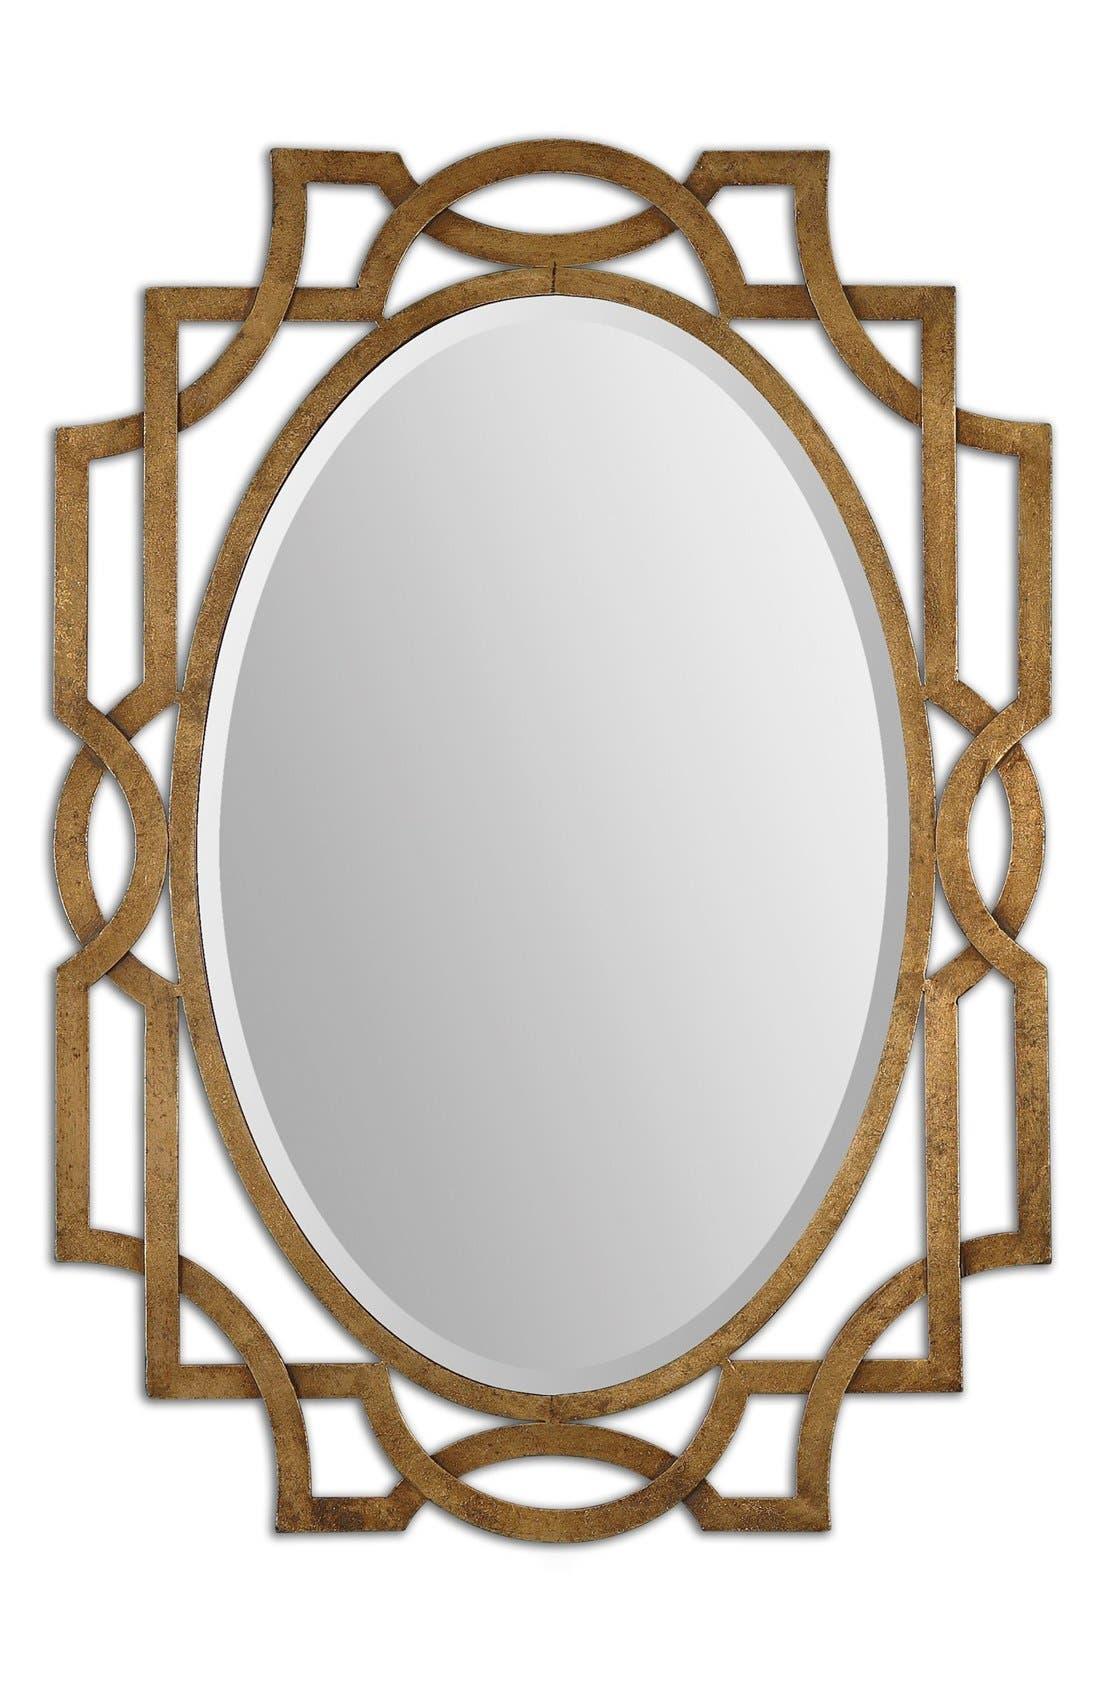 Main Image - Uttermost 'Margutta' Antiqued Goldtone Oval Mirror